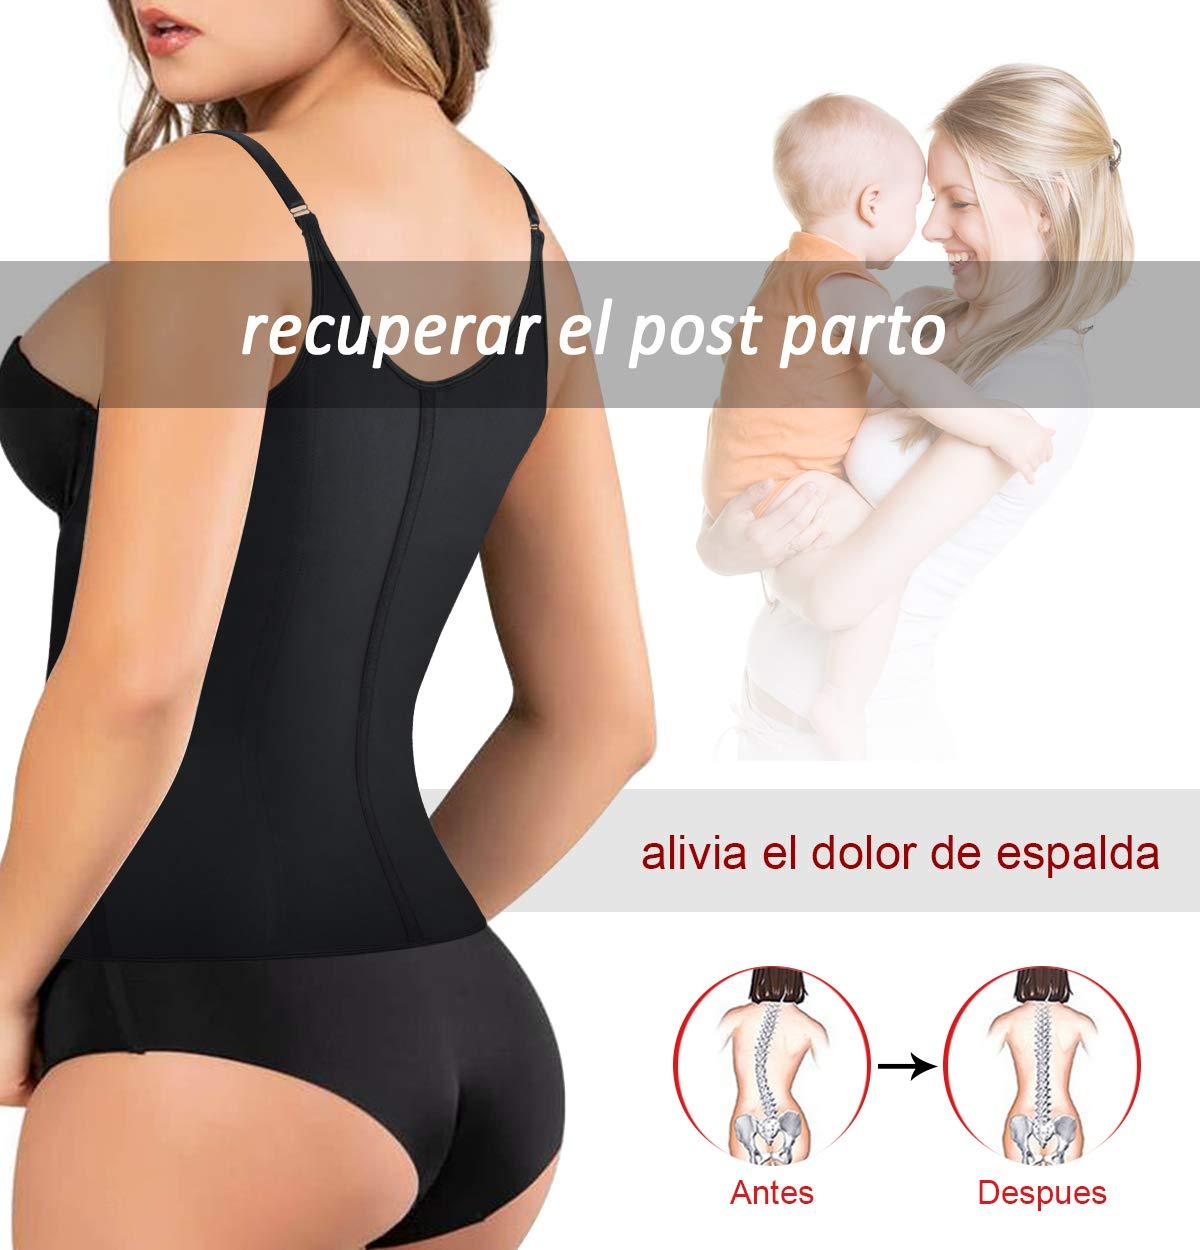 LaLaAreal Fajas Reductoras Corset Cincher Bustiers Cors/é Adelgazantes de Cintur/ón Formaci/ón para Body Shaper Mujer